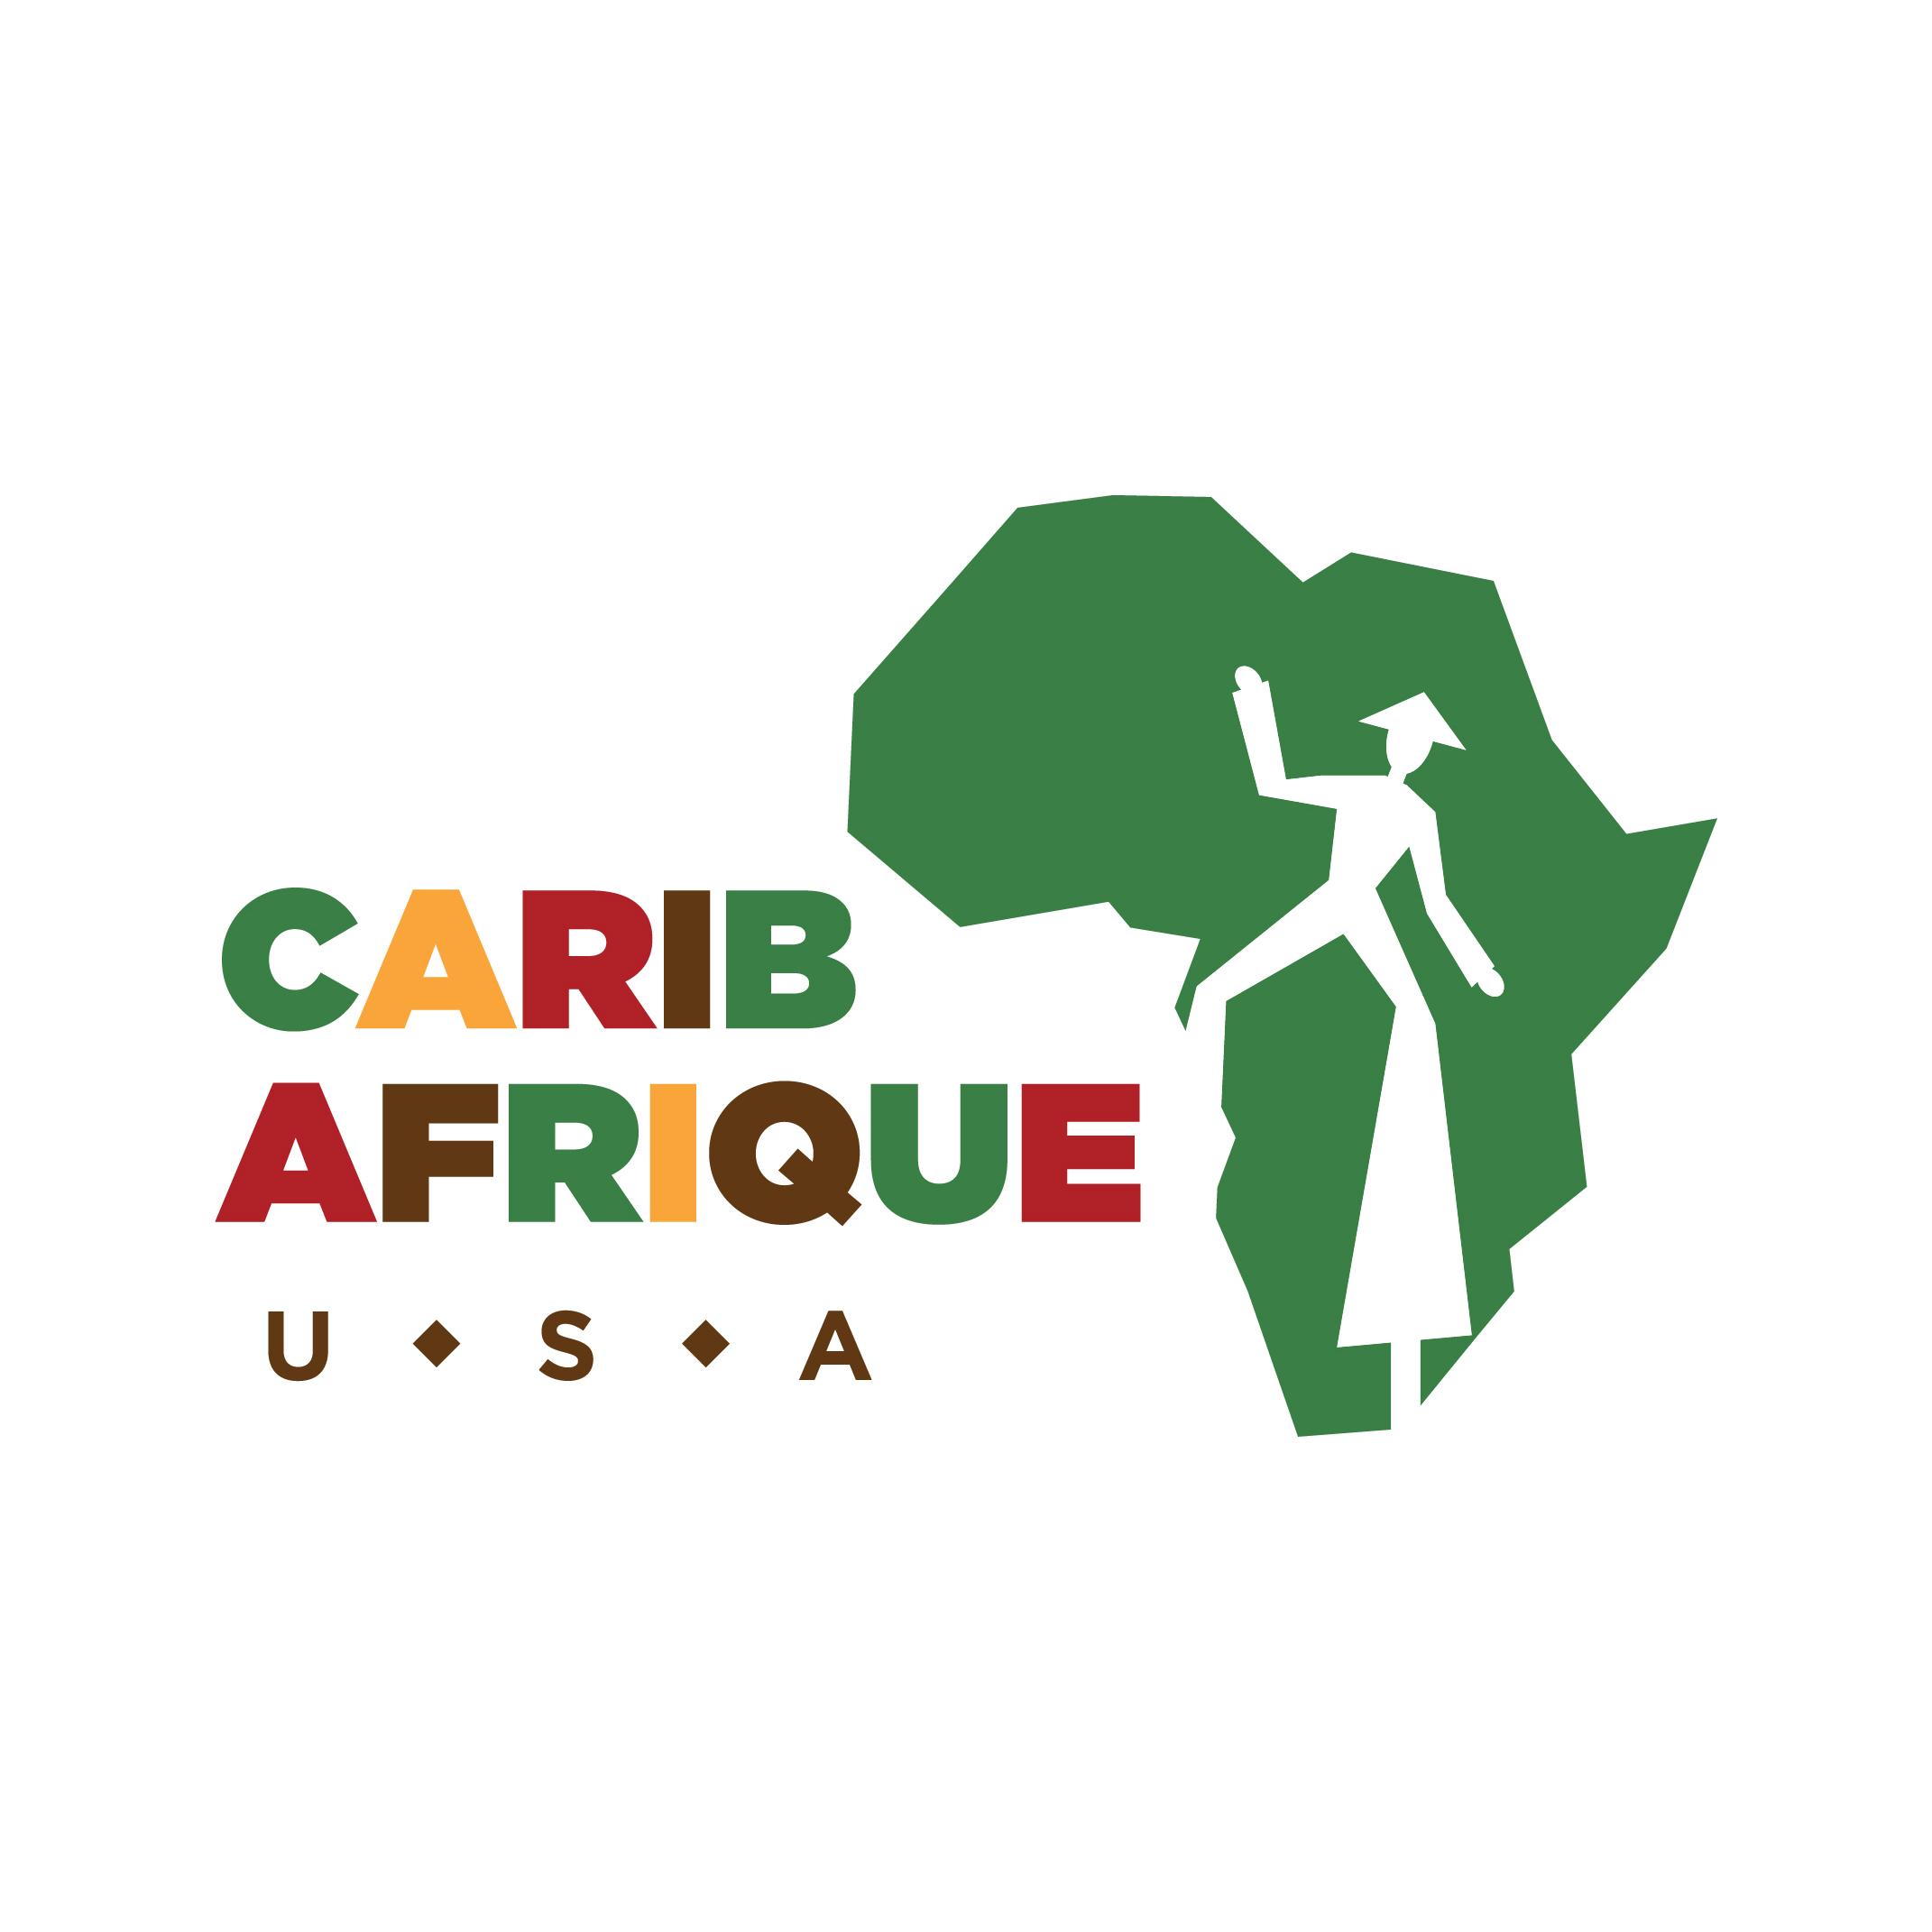 CaribAfriqueLogo_RGB.jpg